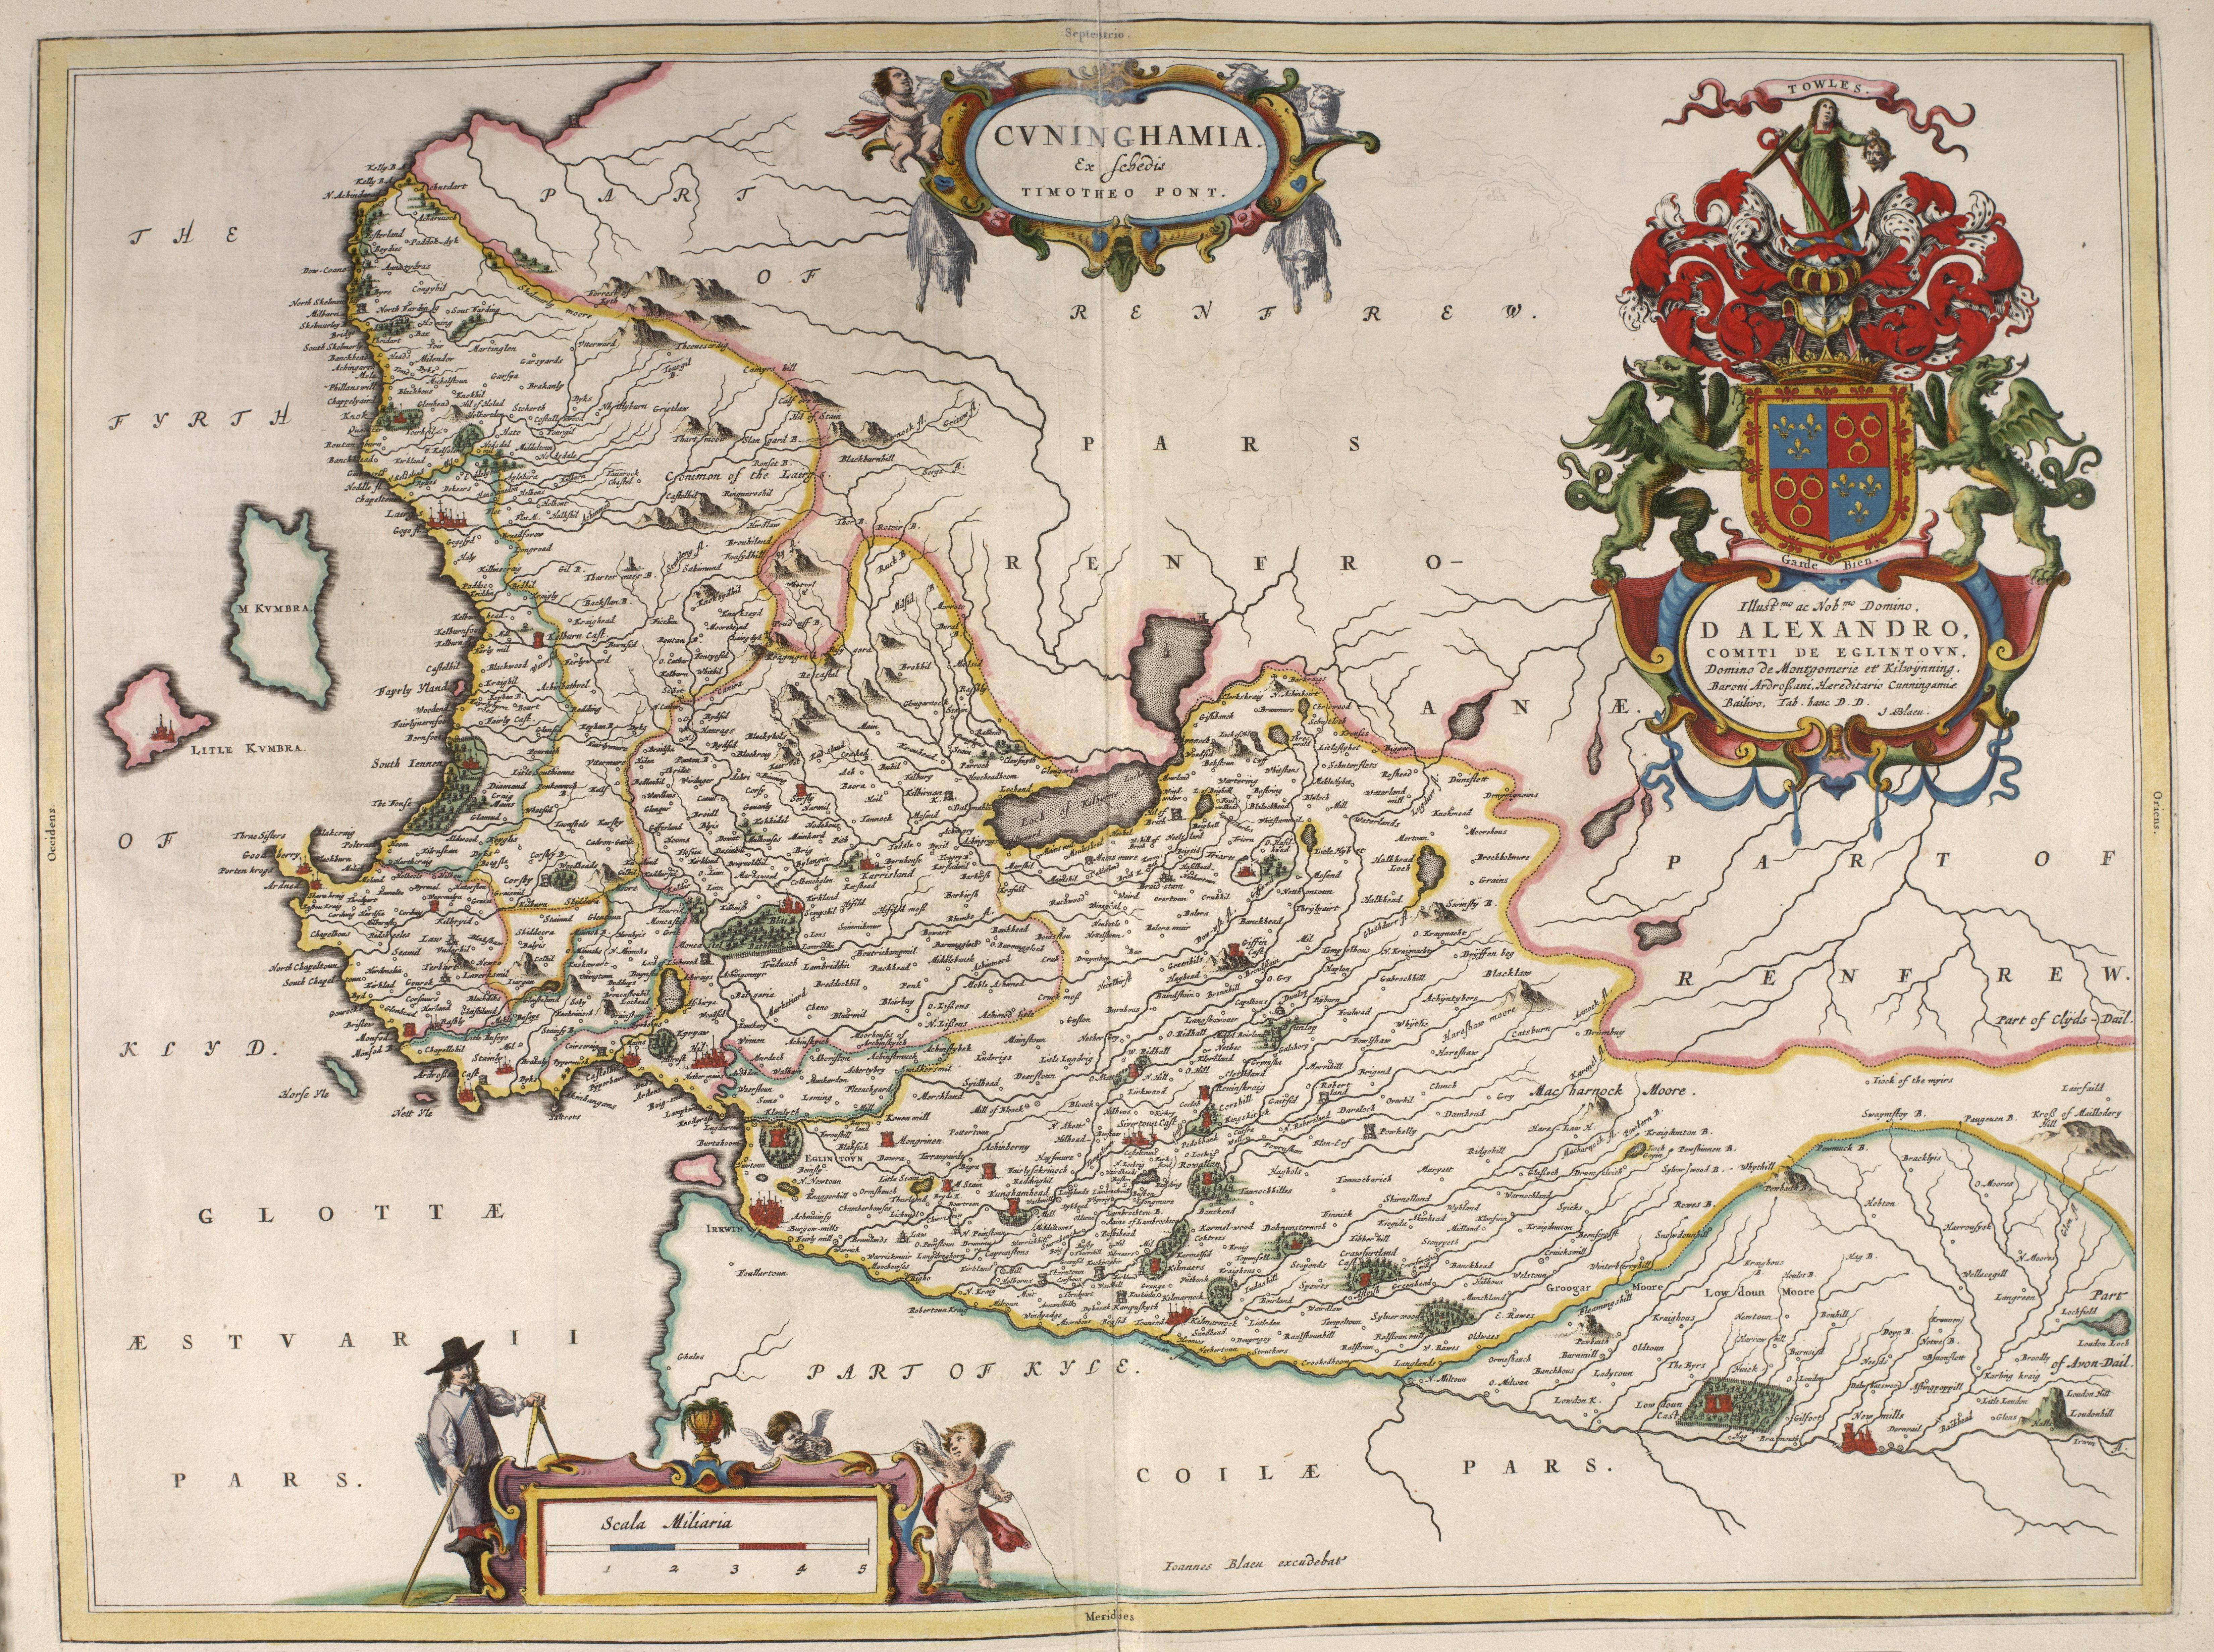 File:Blaeu - Atlas of Scotland 1654 - CVNINGHAMIA - Cunningham.jpg